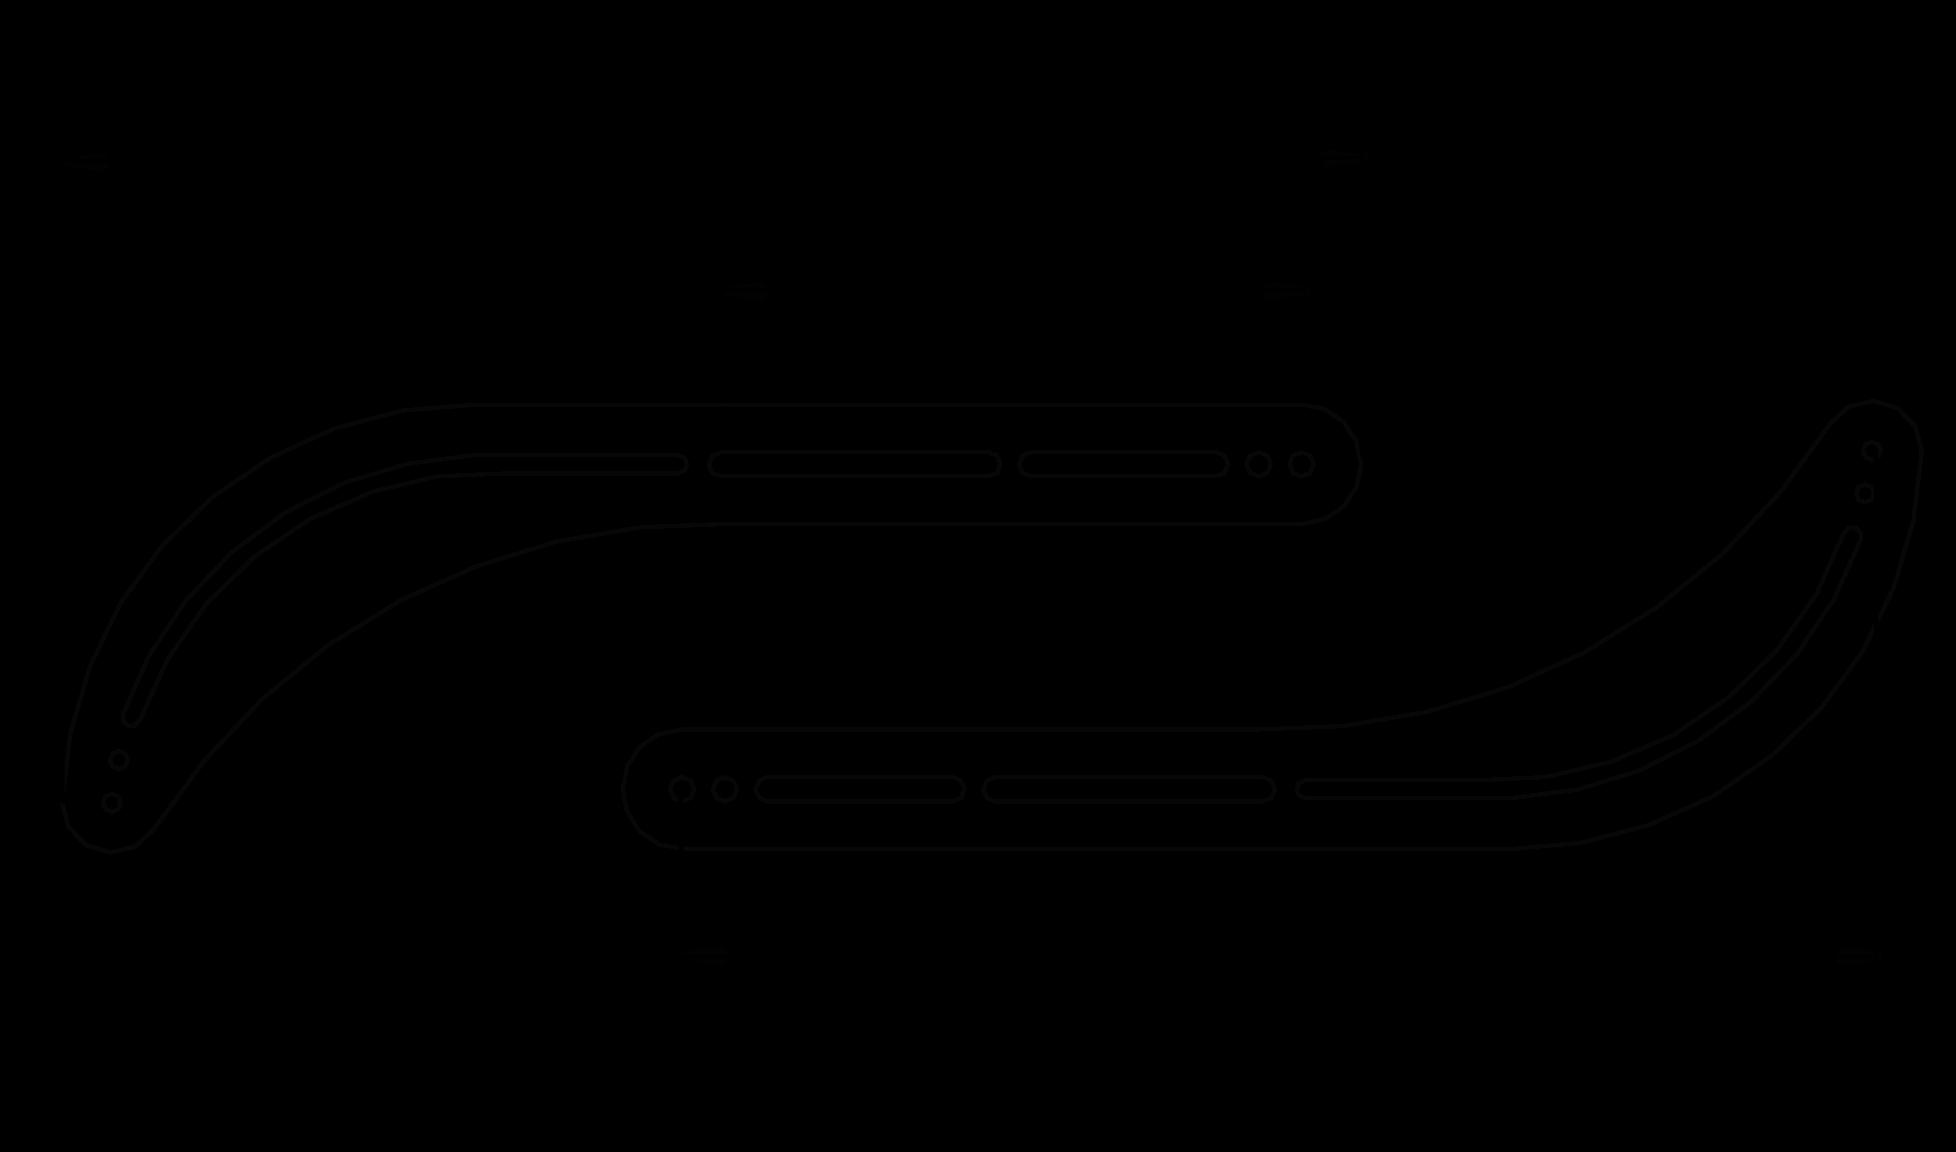 Drawing Lines Sound Effect : Universal sound bar bracket